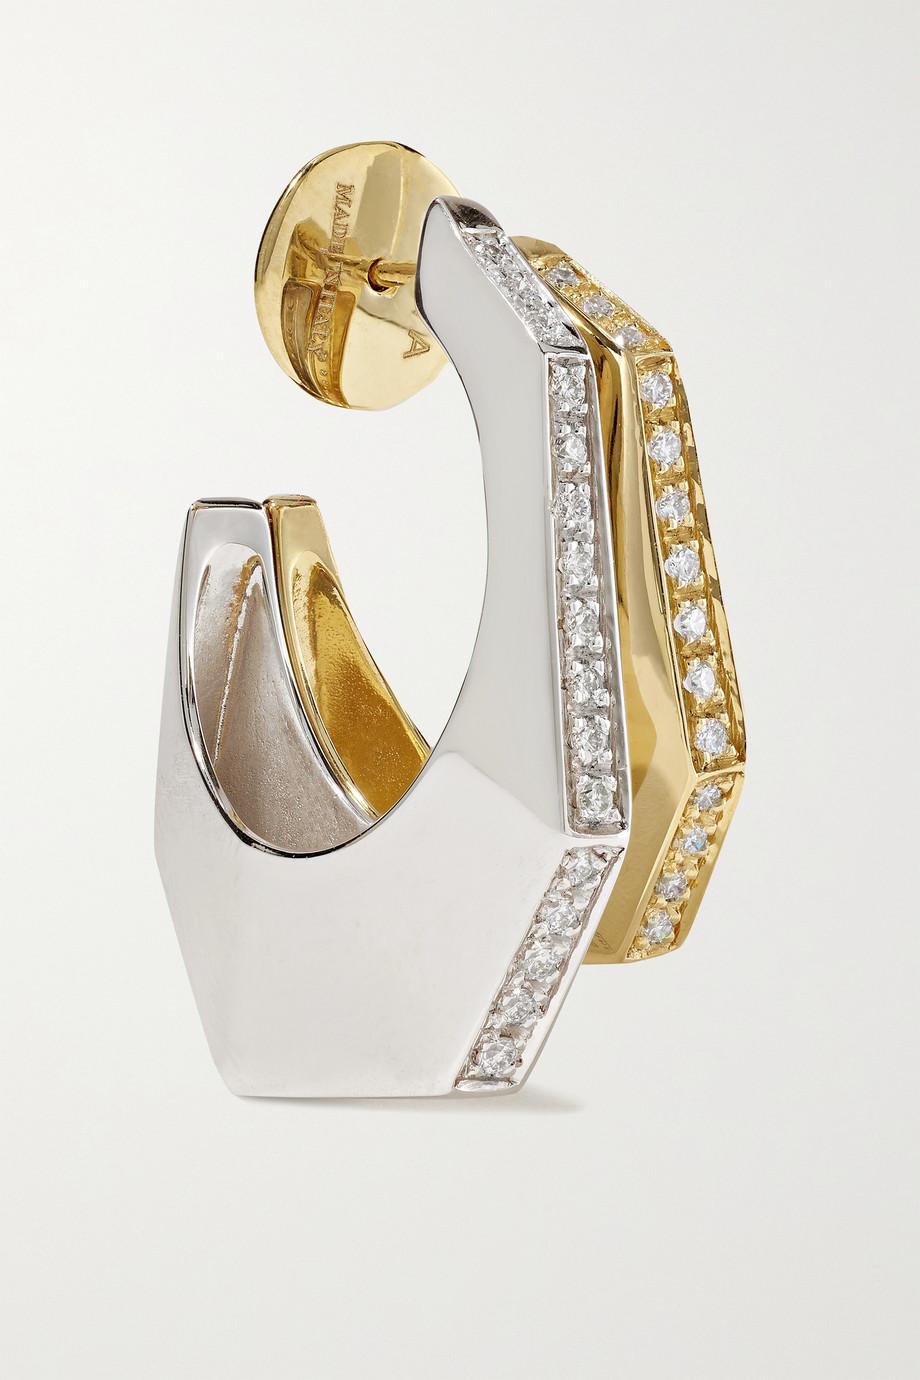 EÉRA Sabrina 18-karat yellow and white gold diamond earring